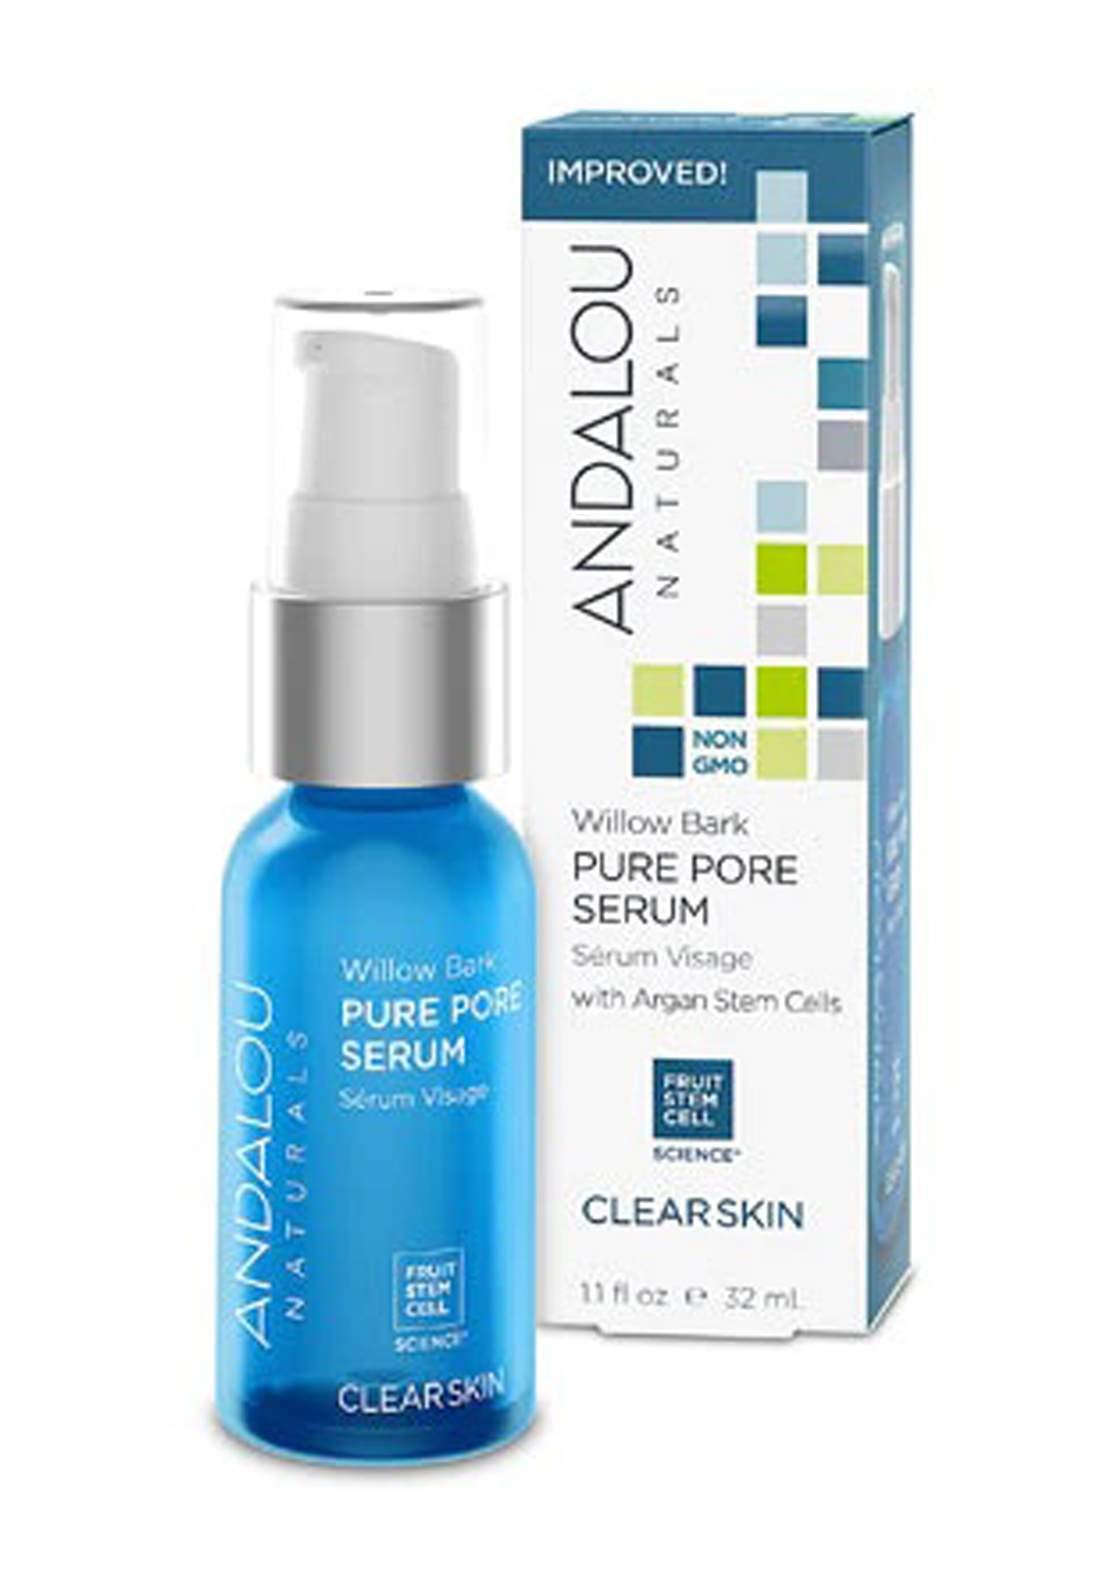 2553 Andalou Naturals Clear Skin Willow Bark Pure Pore Serum 32ml سيروم معالج للبشرة